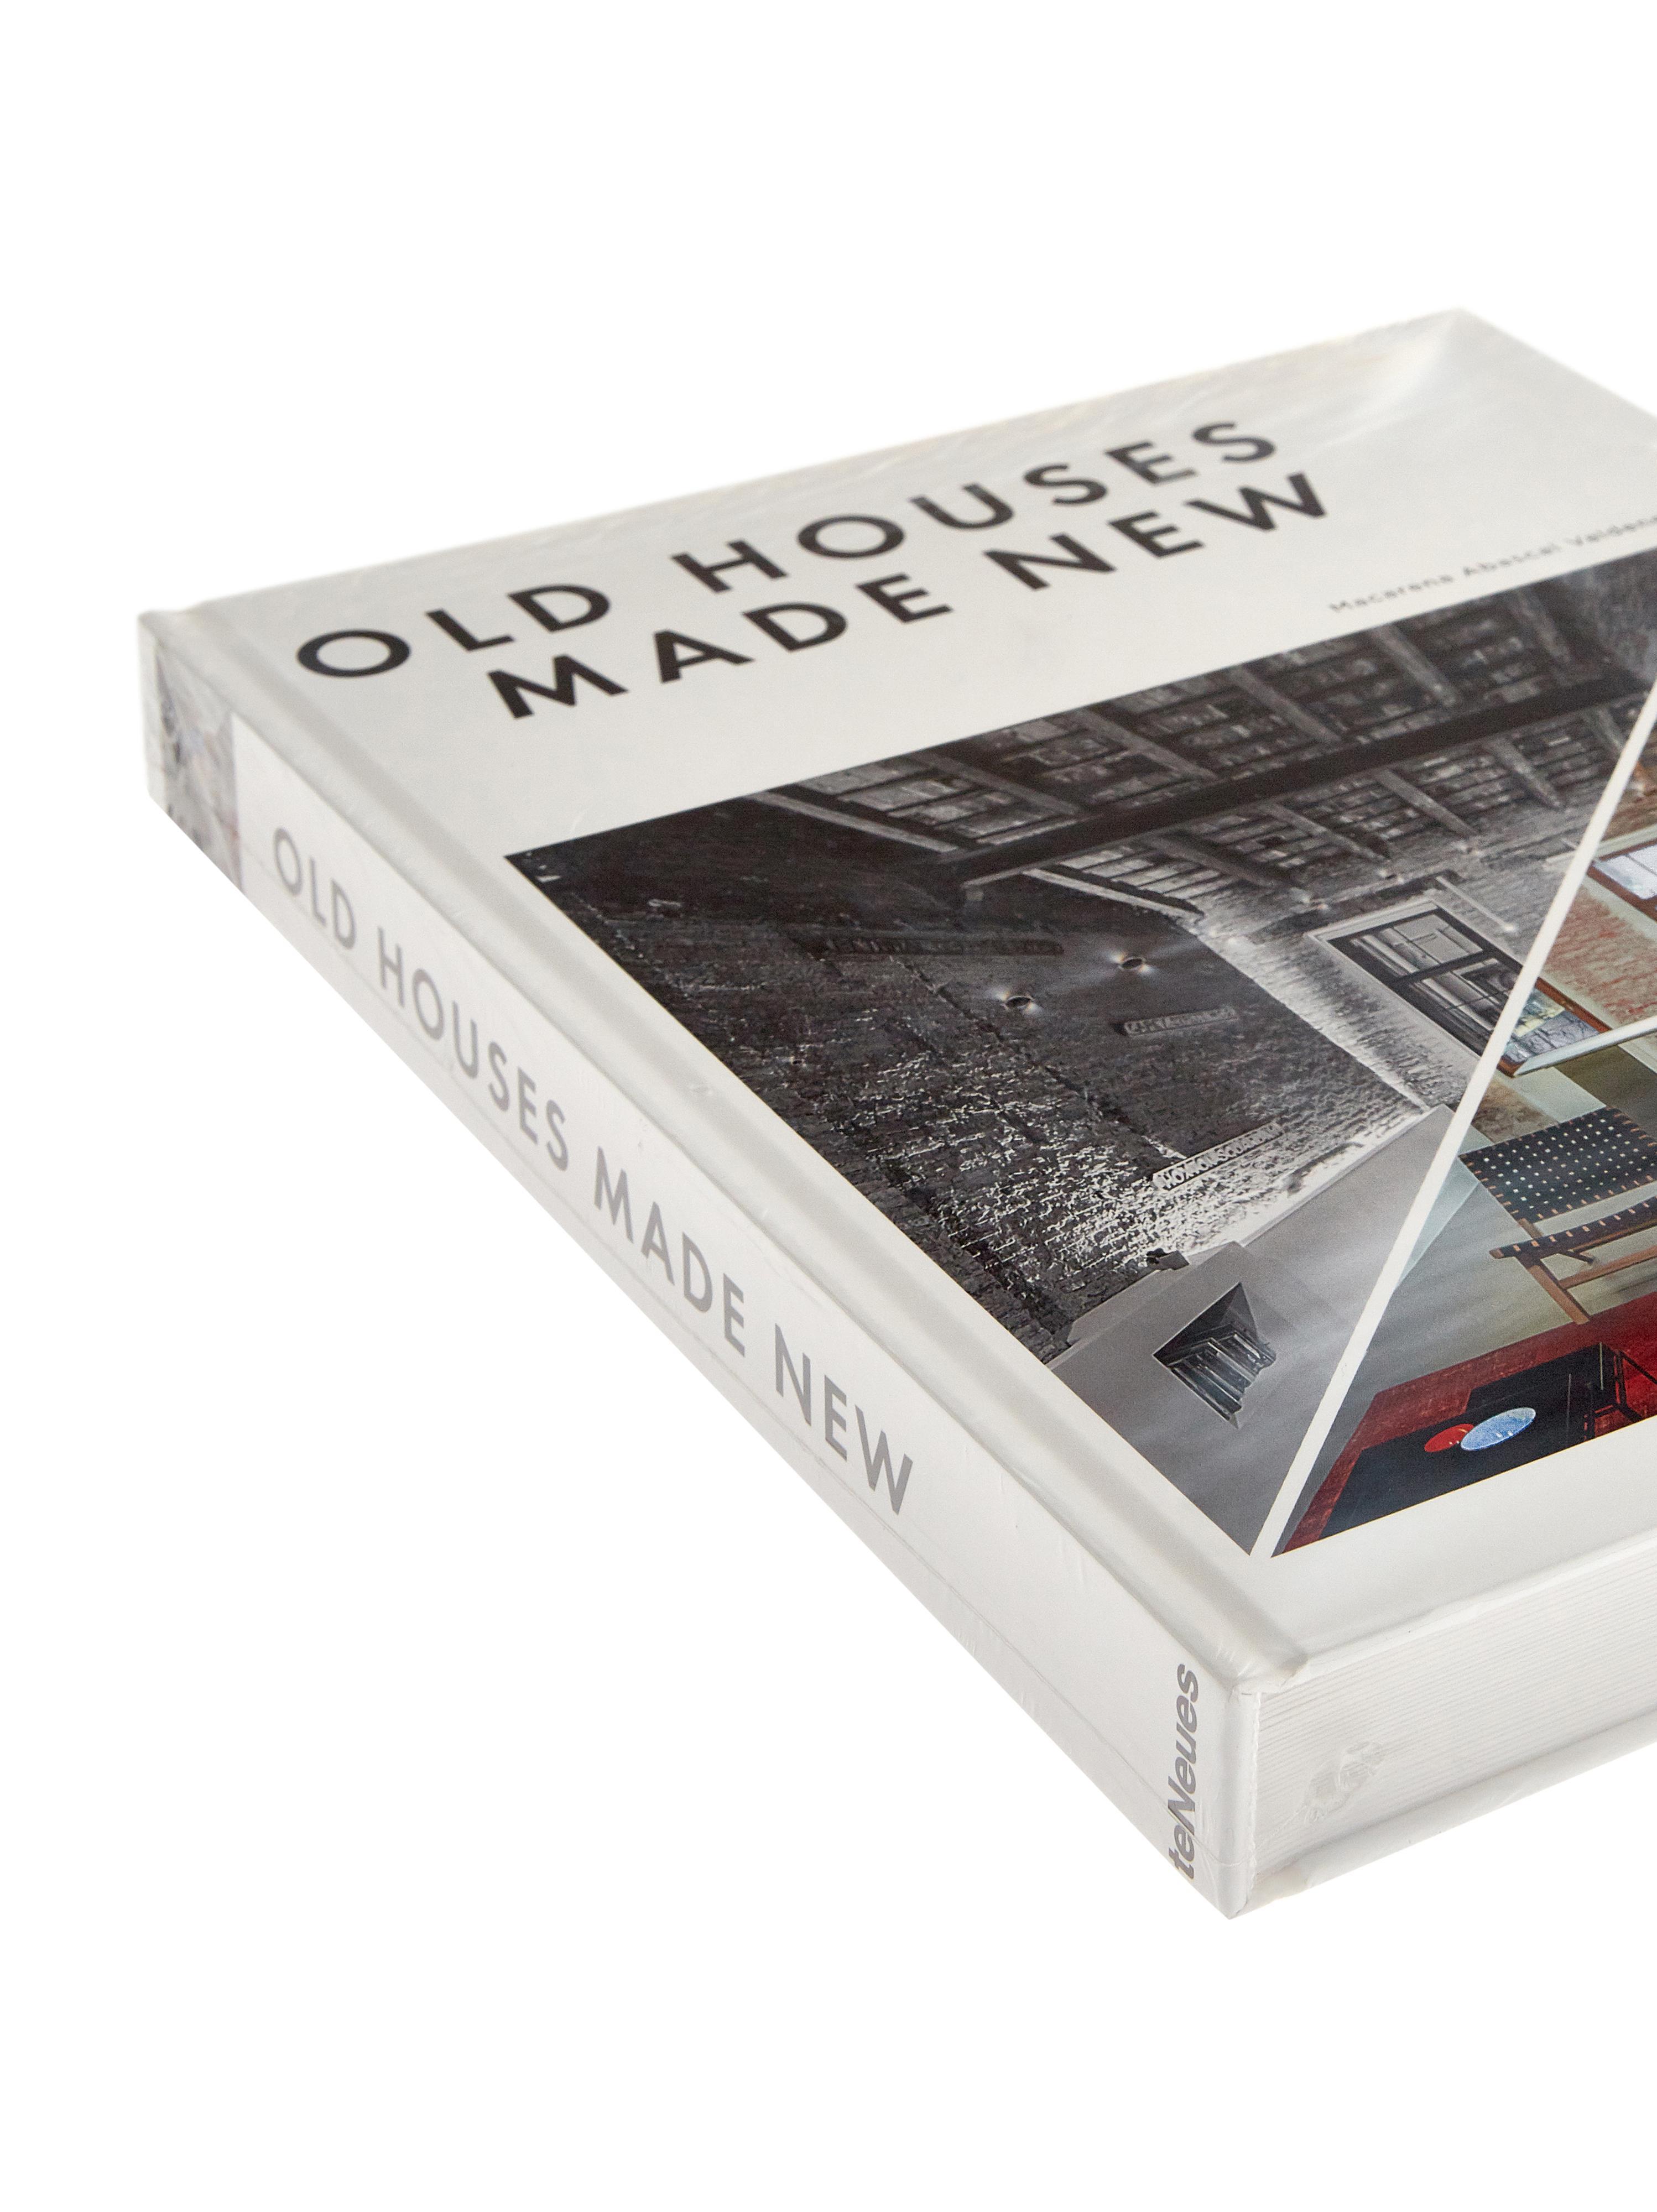 Koffietafelboek Old Houses Made New, Papier, hardcover, Multicolour, 25 x 32 cm